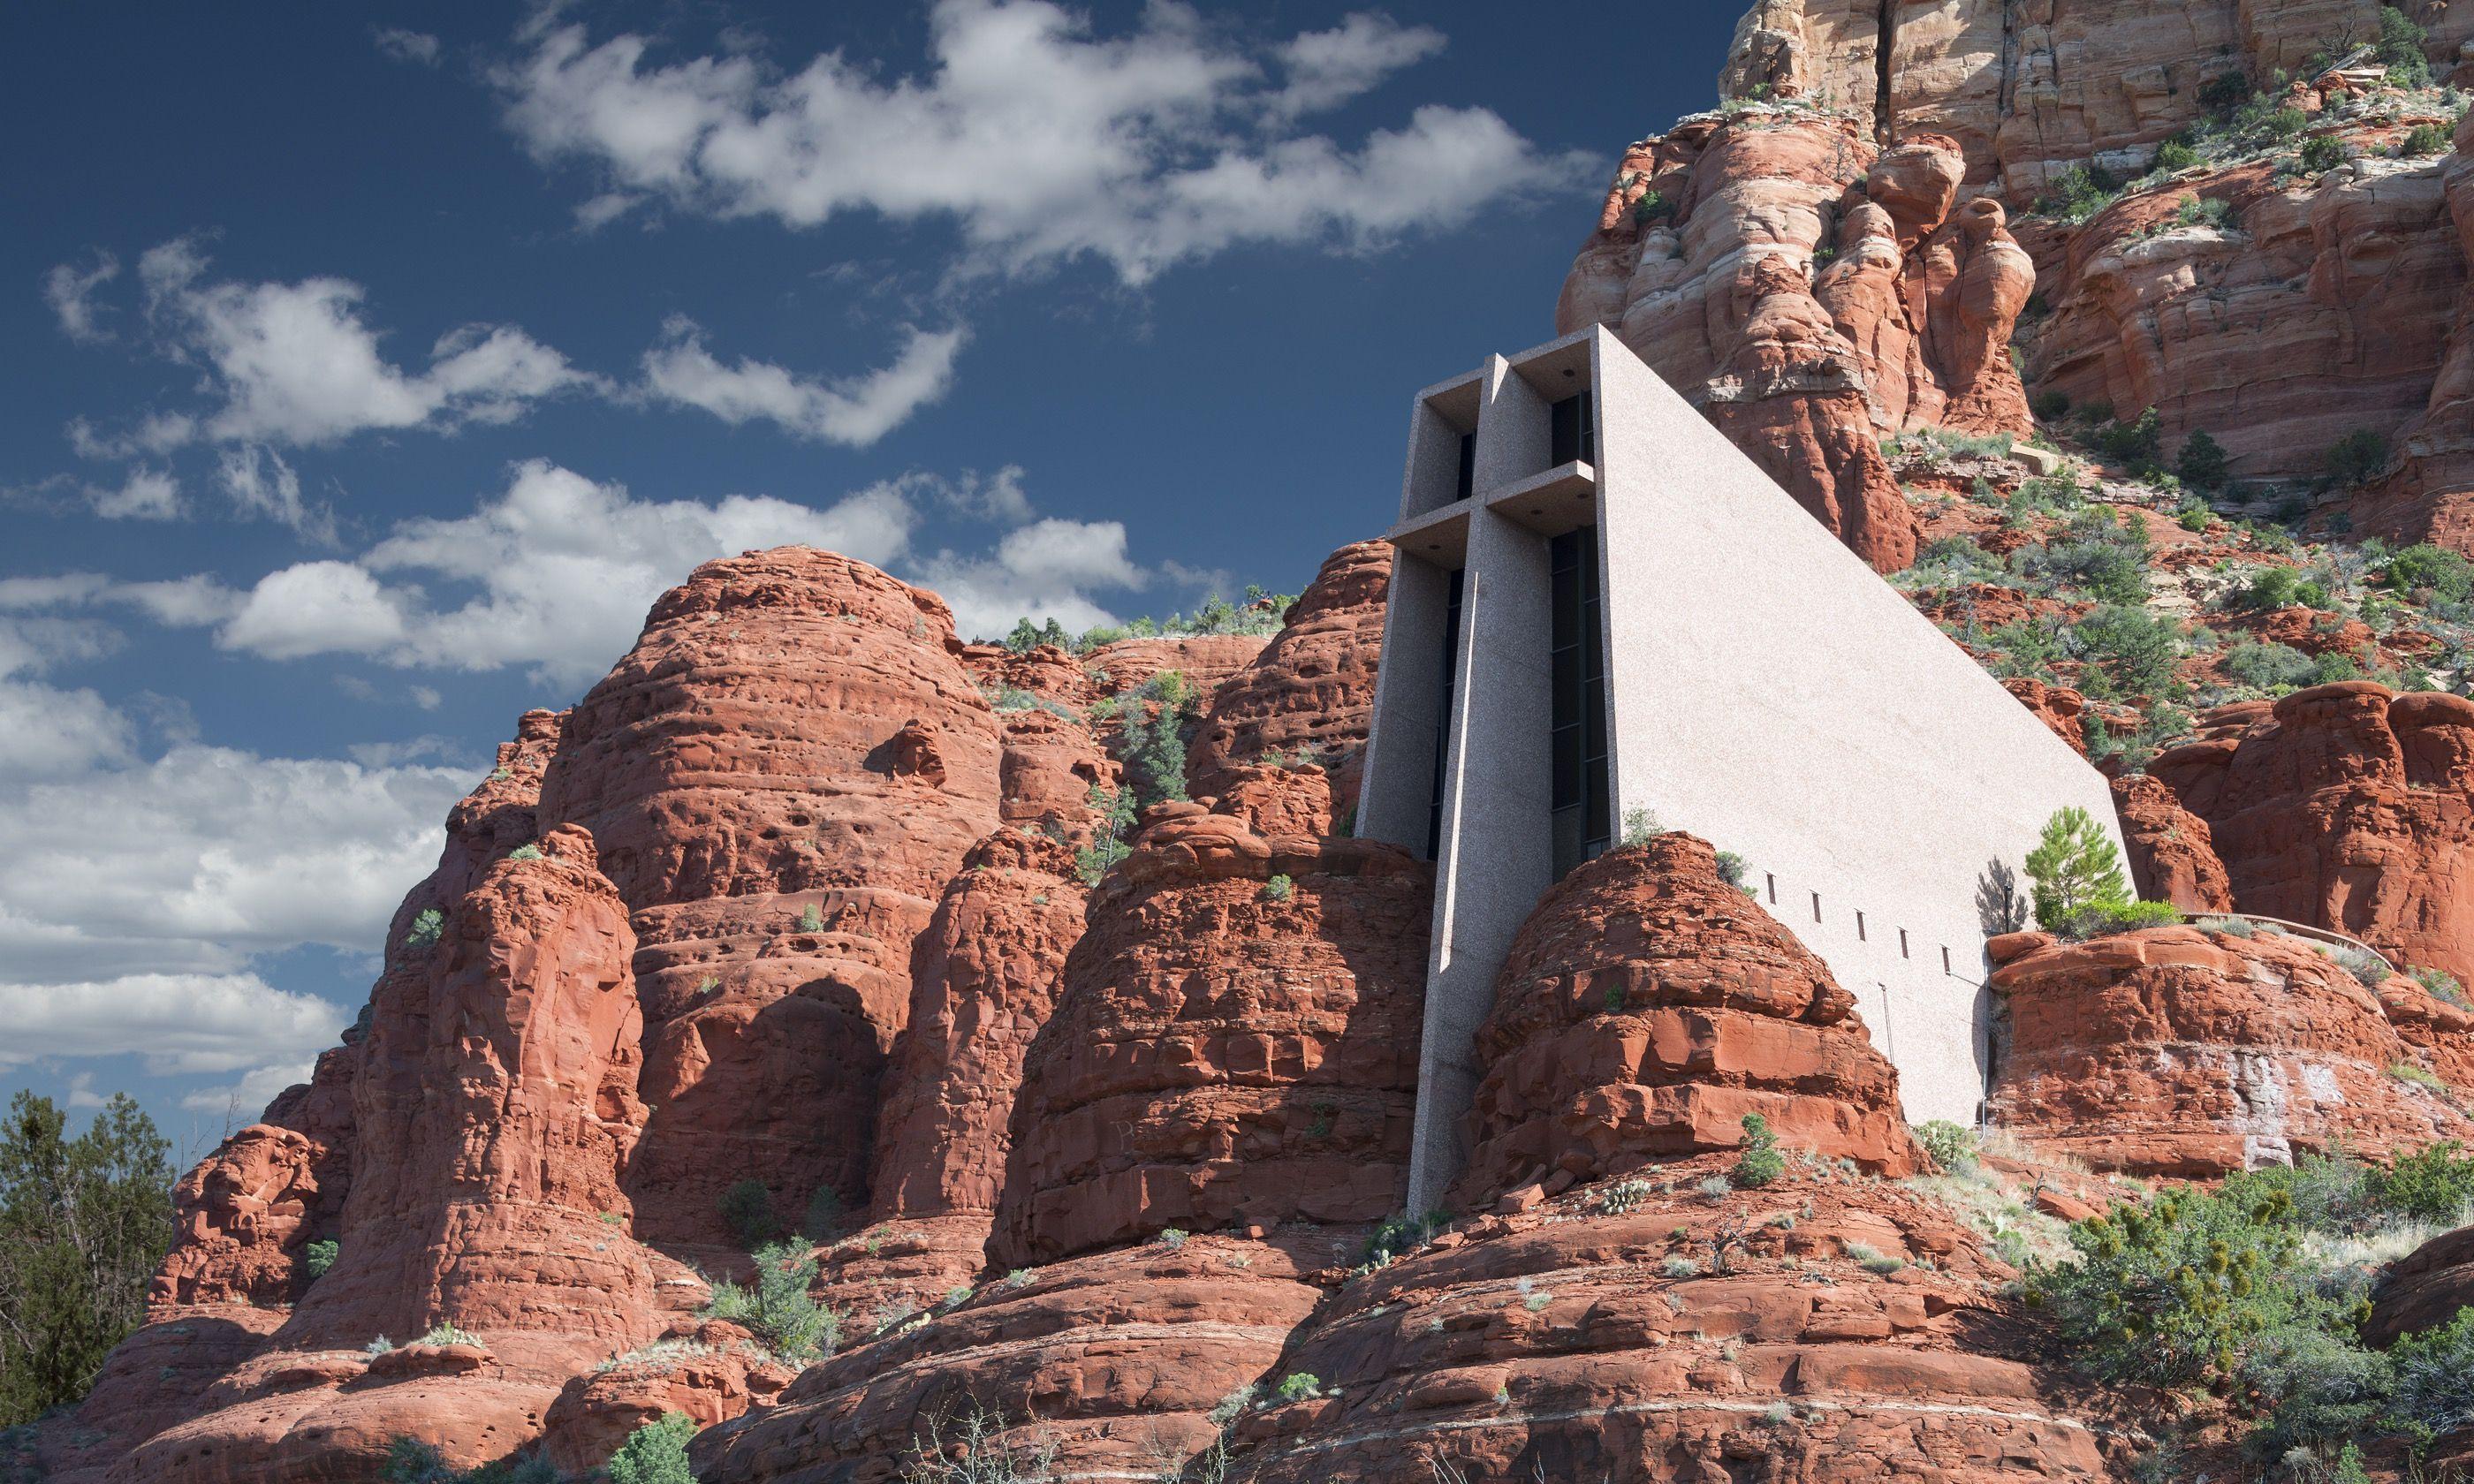 Chapel Of The Holy Cross In Sedona Arizona (Shutterstock.com)